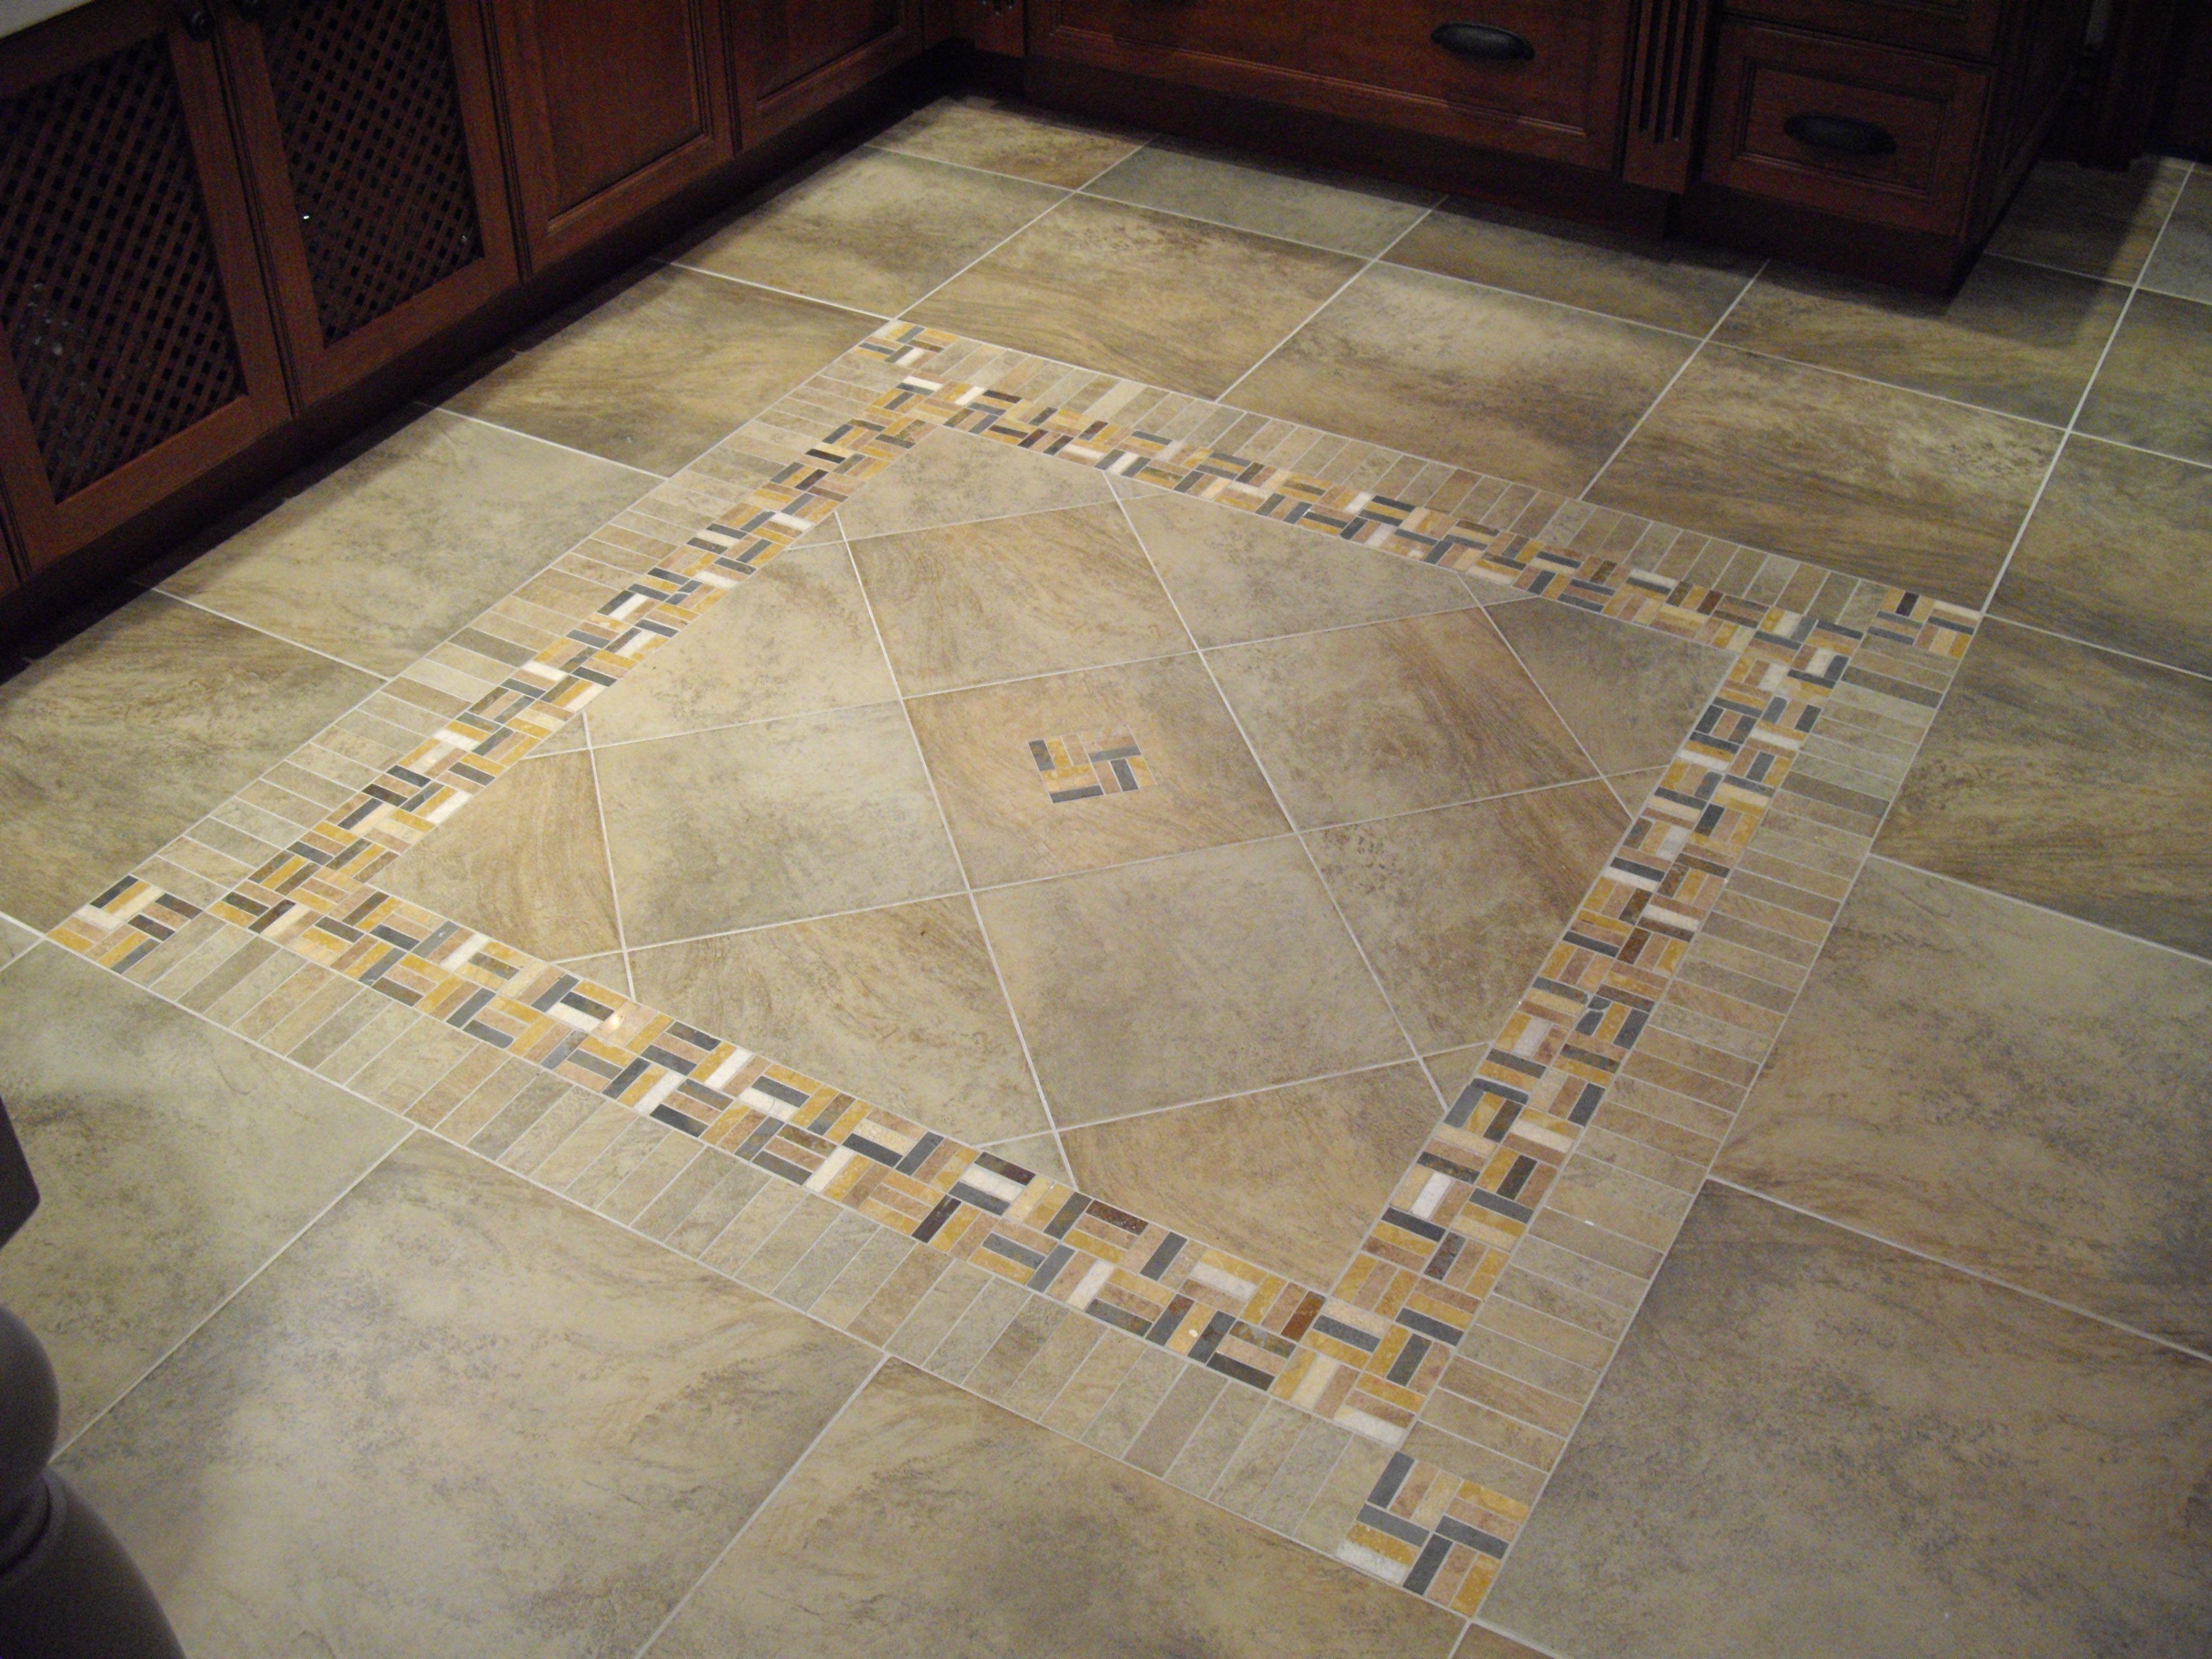 kitchen floor kitchen floor tile designs Frugal Floor Tile Patterns For Small Spaces and tile floor pattern calculations